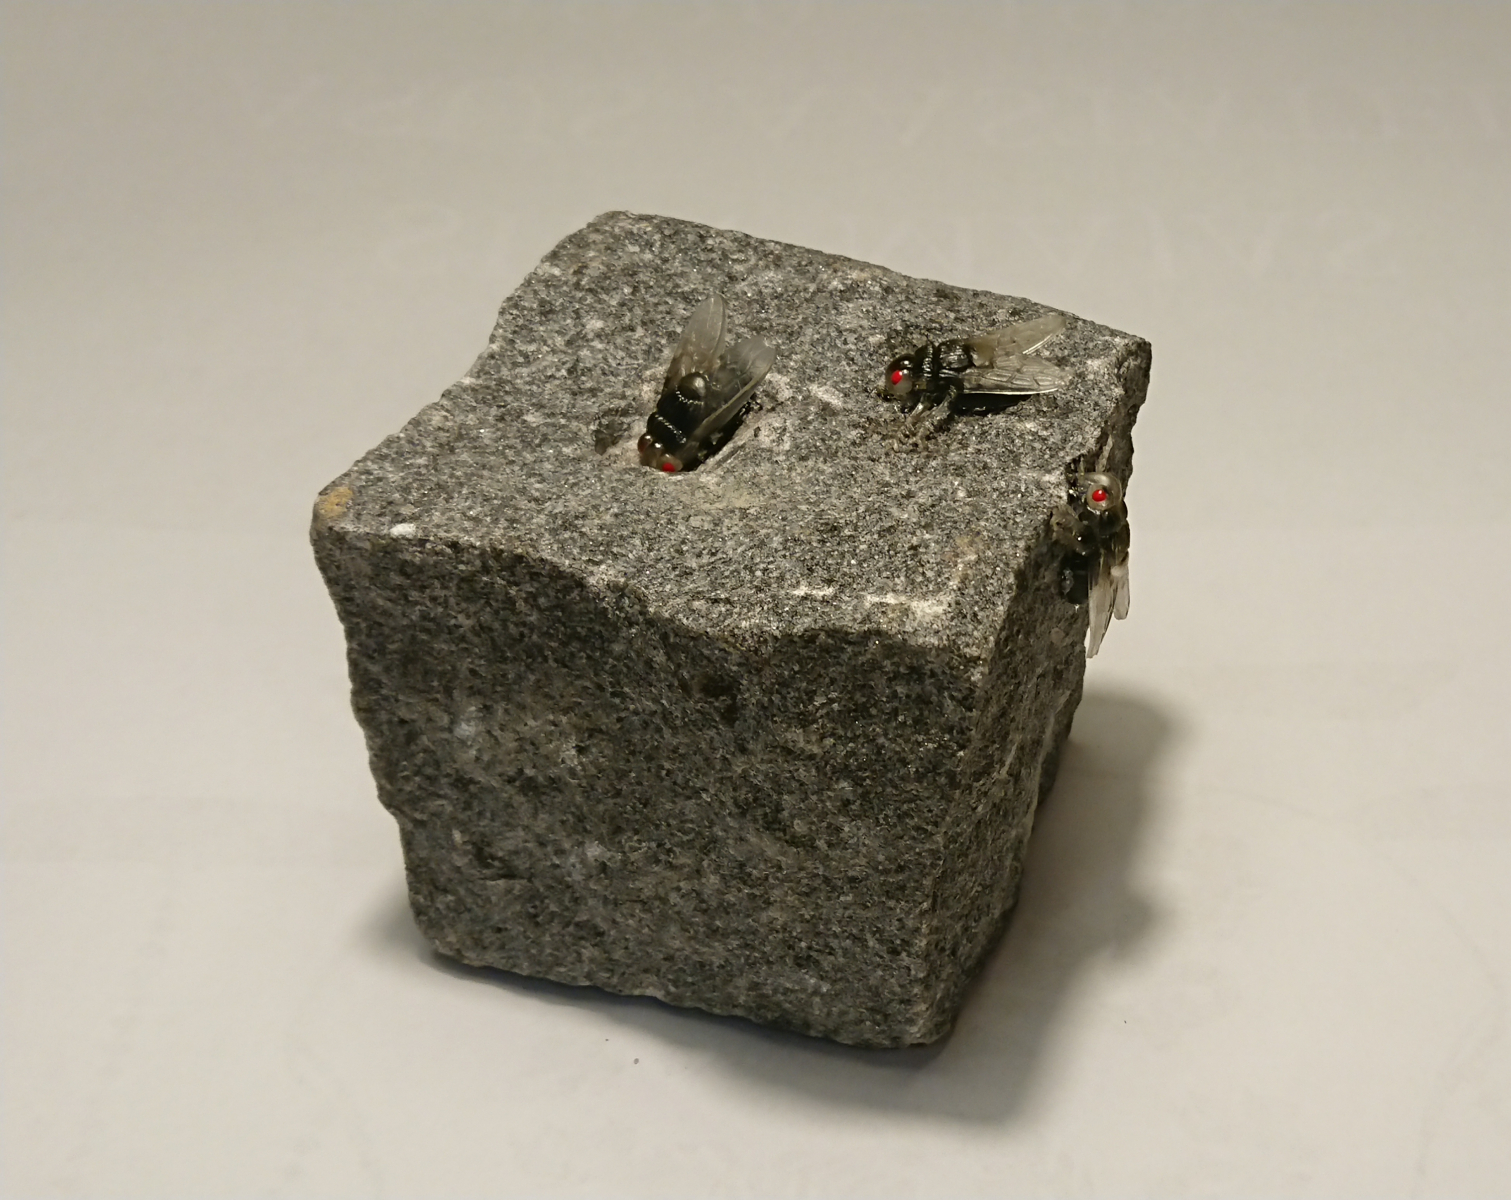 """UUDISHIMU"" 2019 graniit,plastik<br/> ""CURIOSITY"" 2019 granit,plastic"